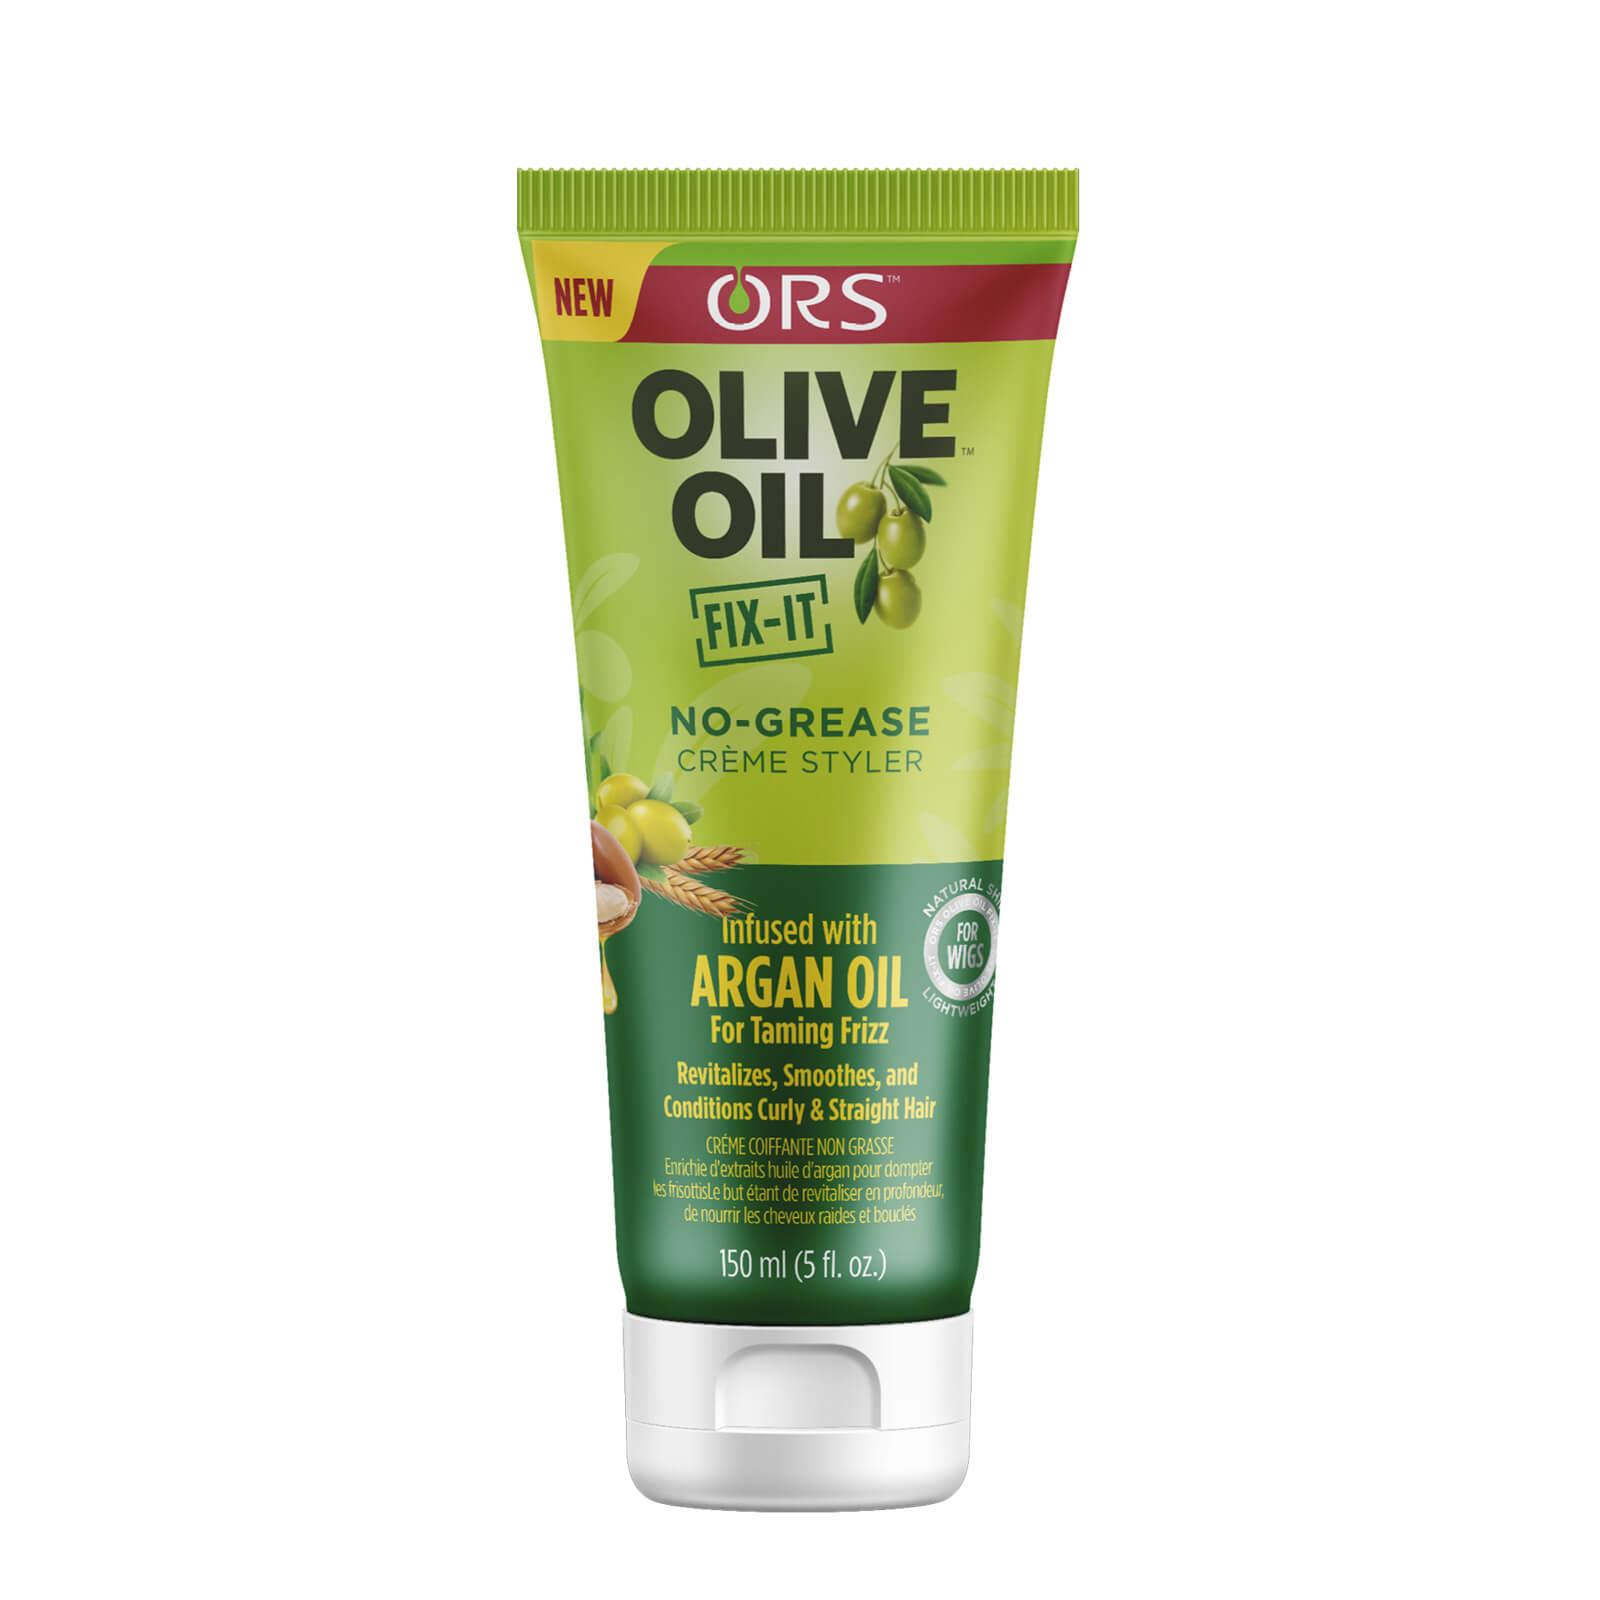 Купить ORS Olive Oil No Grease Creme Styler (Fix It) 150ml